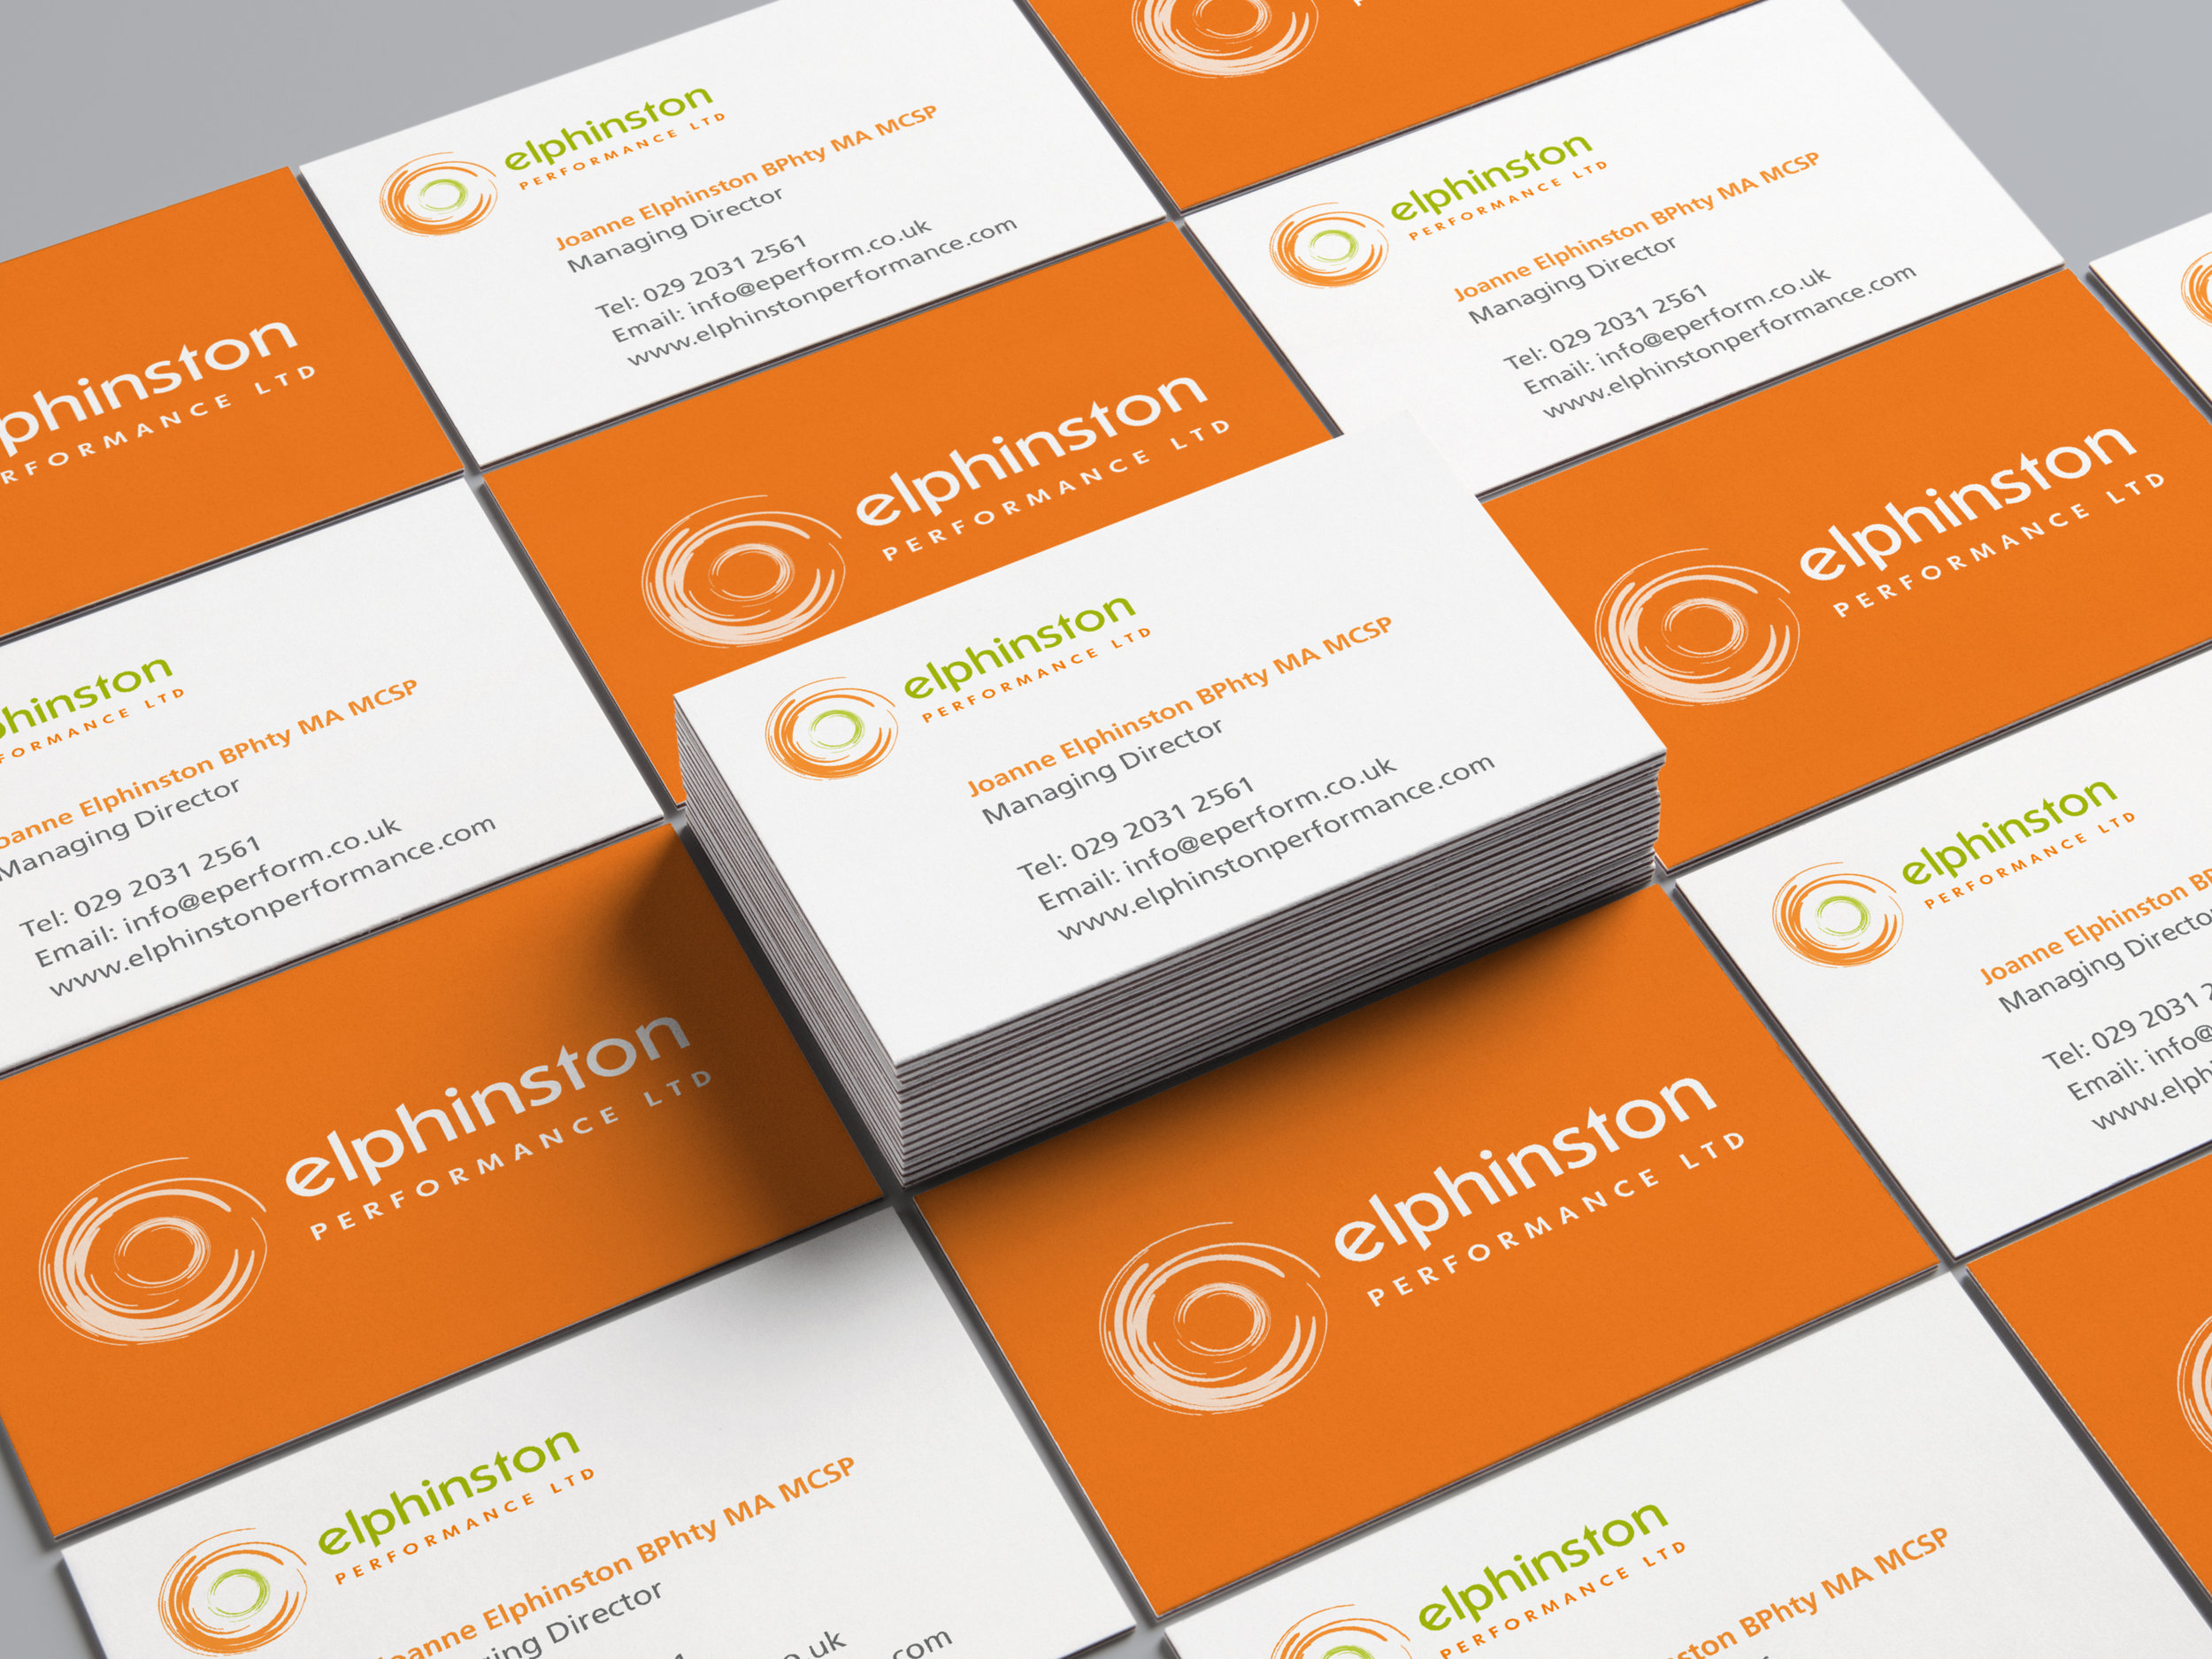 Elphinston-Performance-Business-Cards.jpg